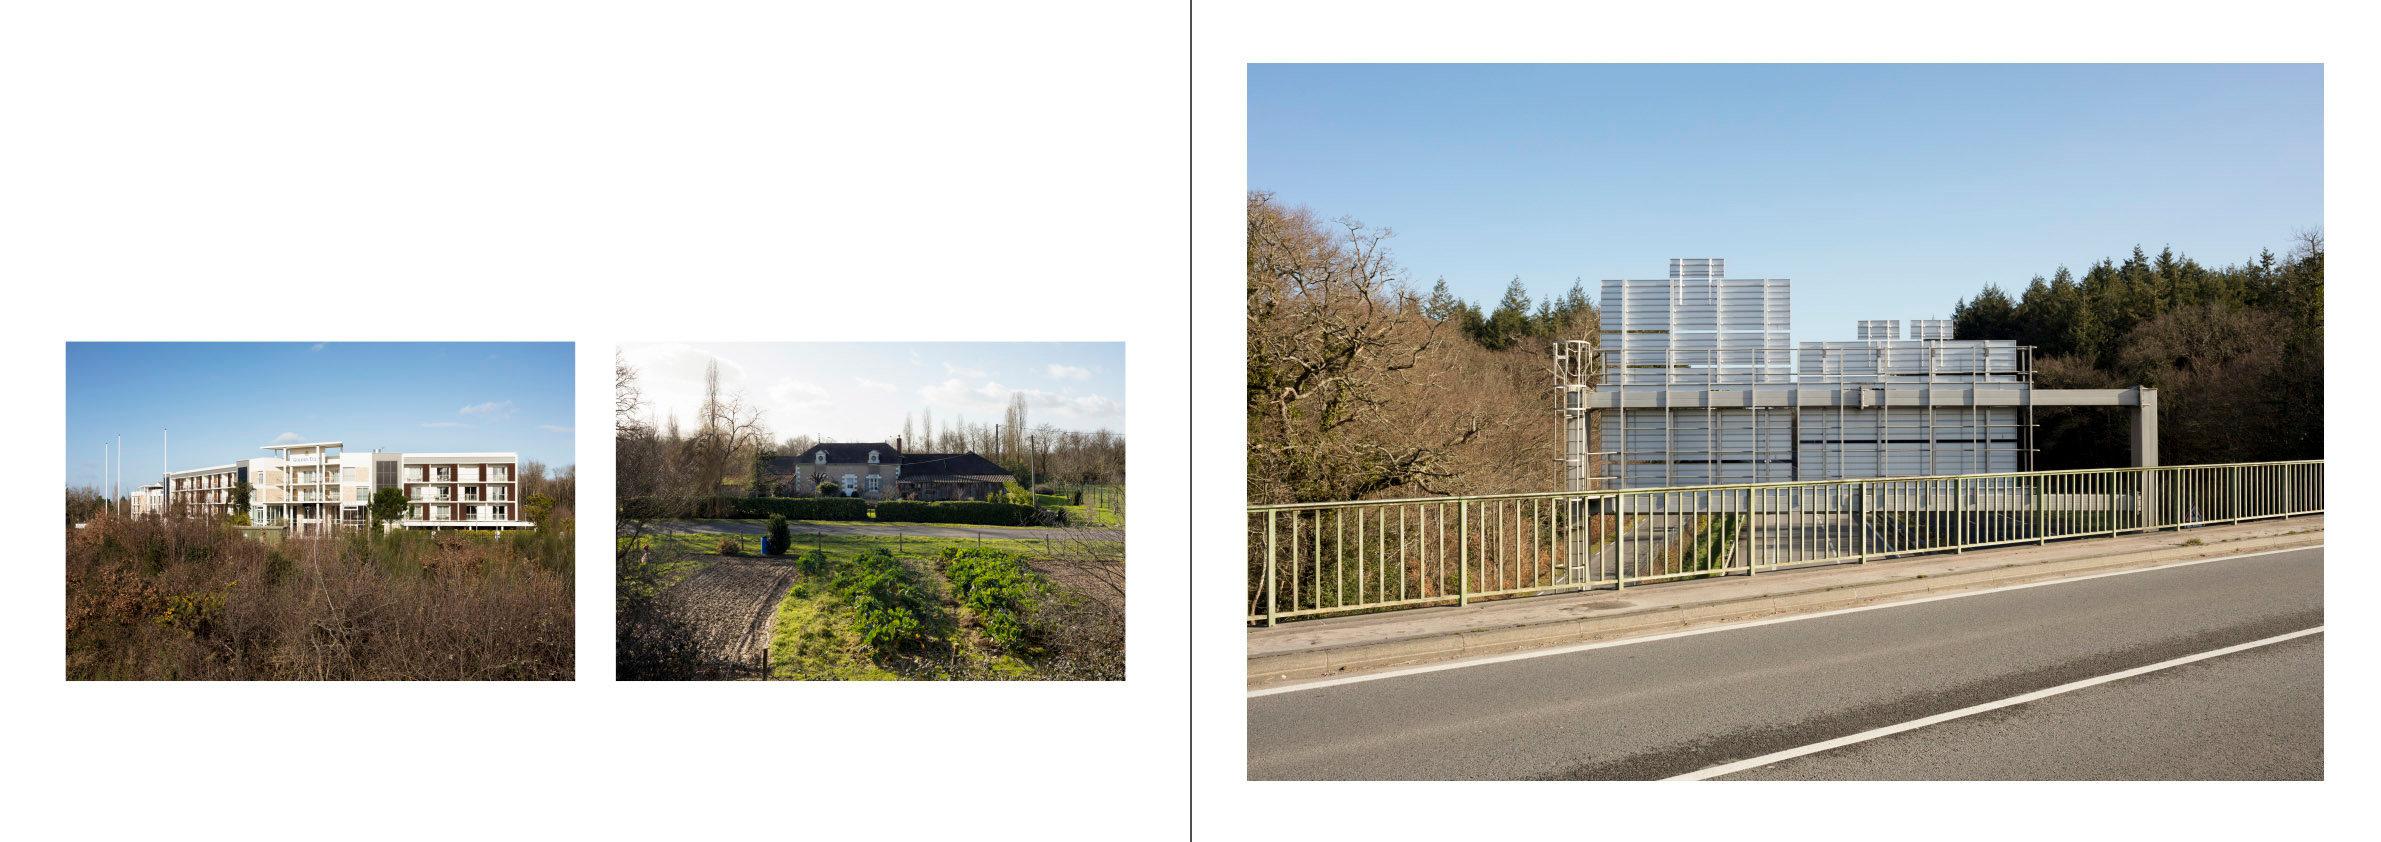 Nantes-Carquefou-Ste Luce A3-page045.jpeg